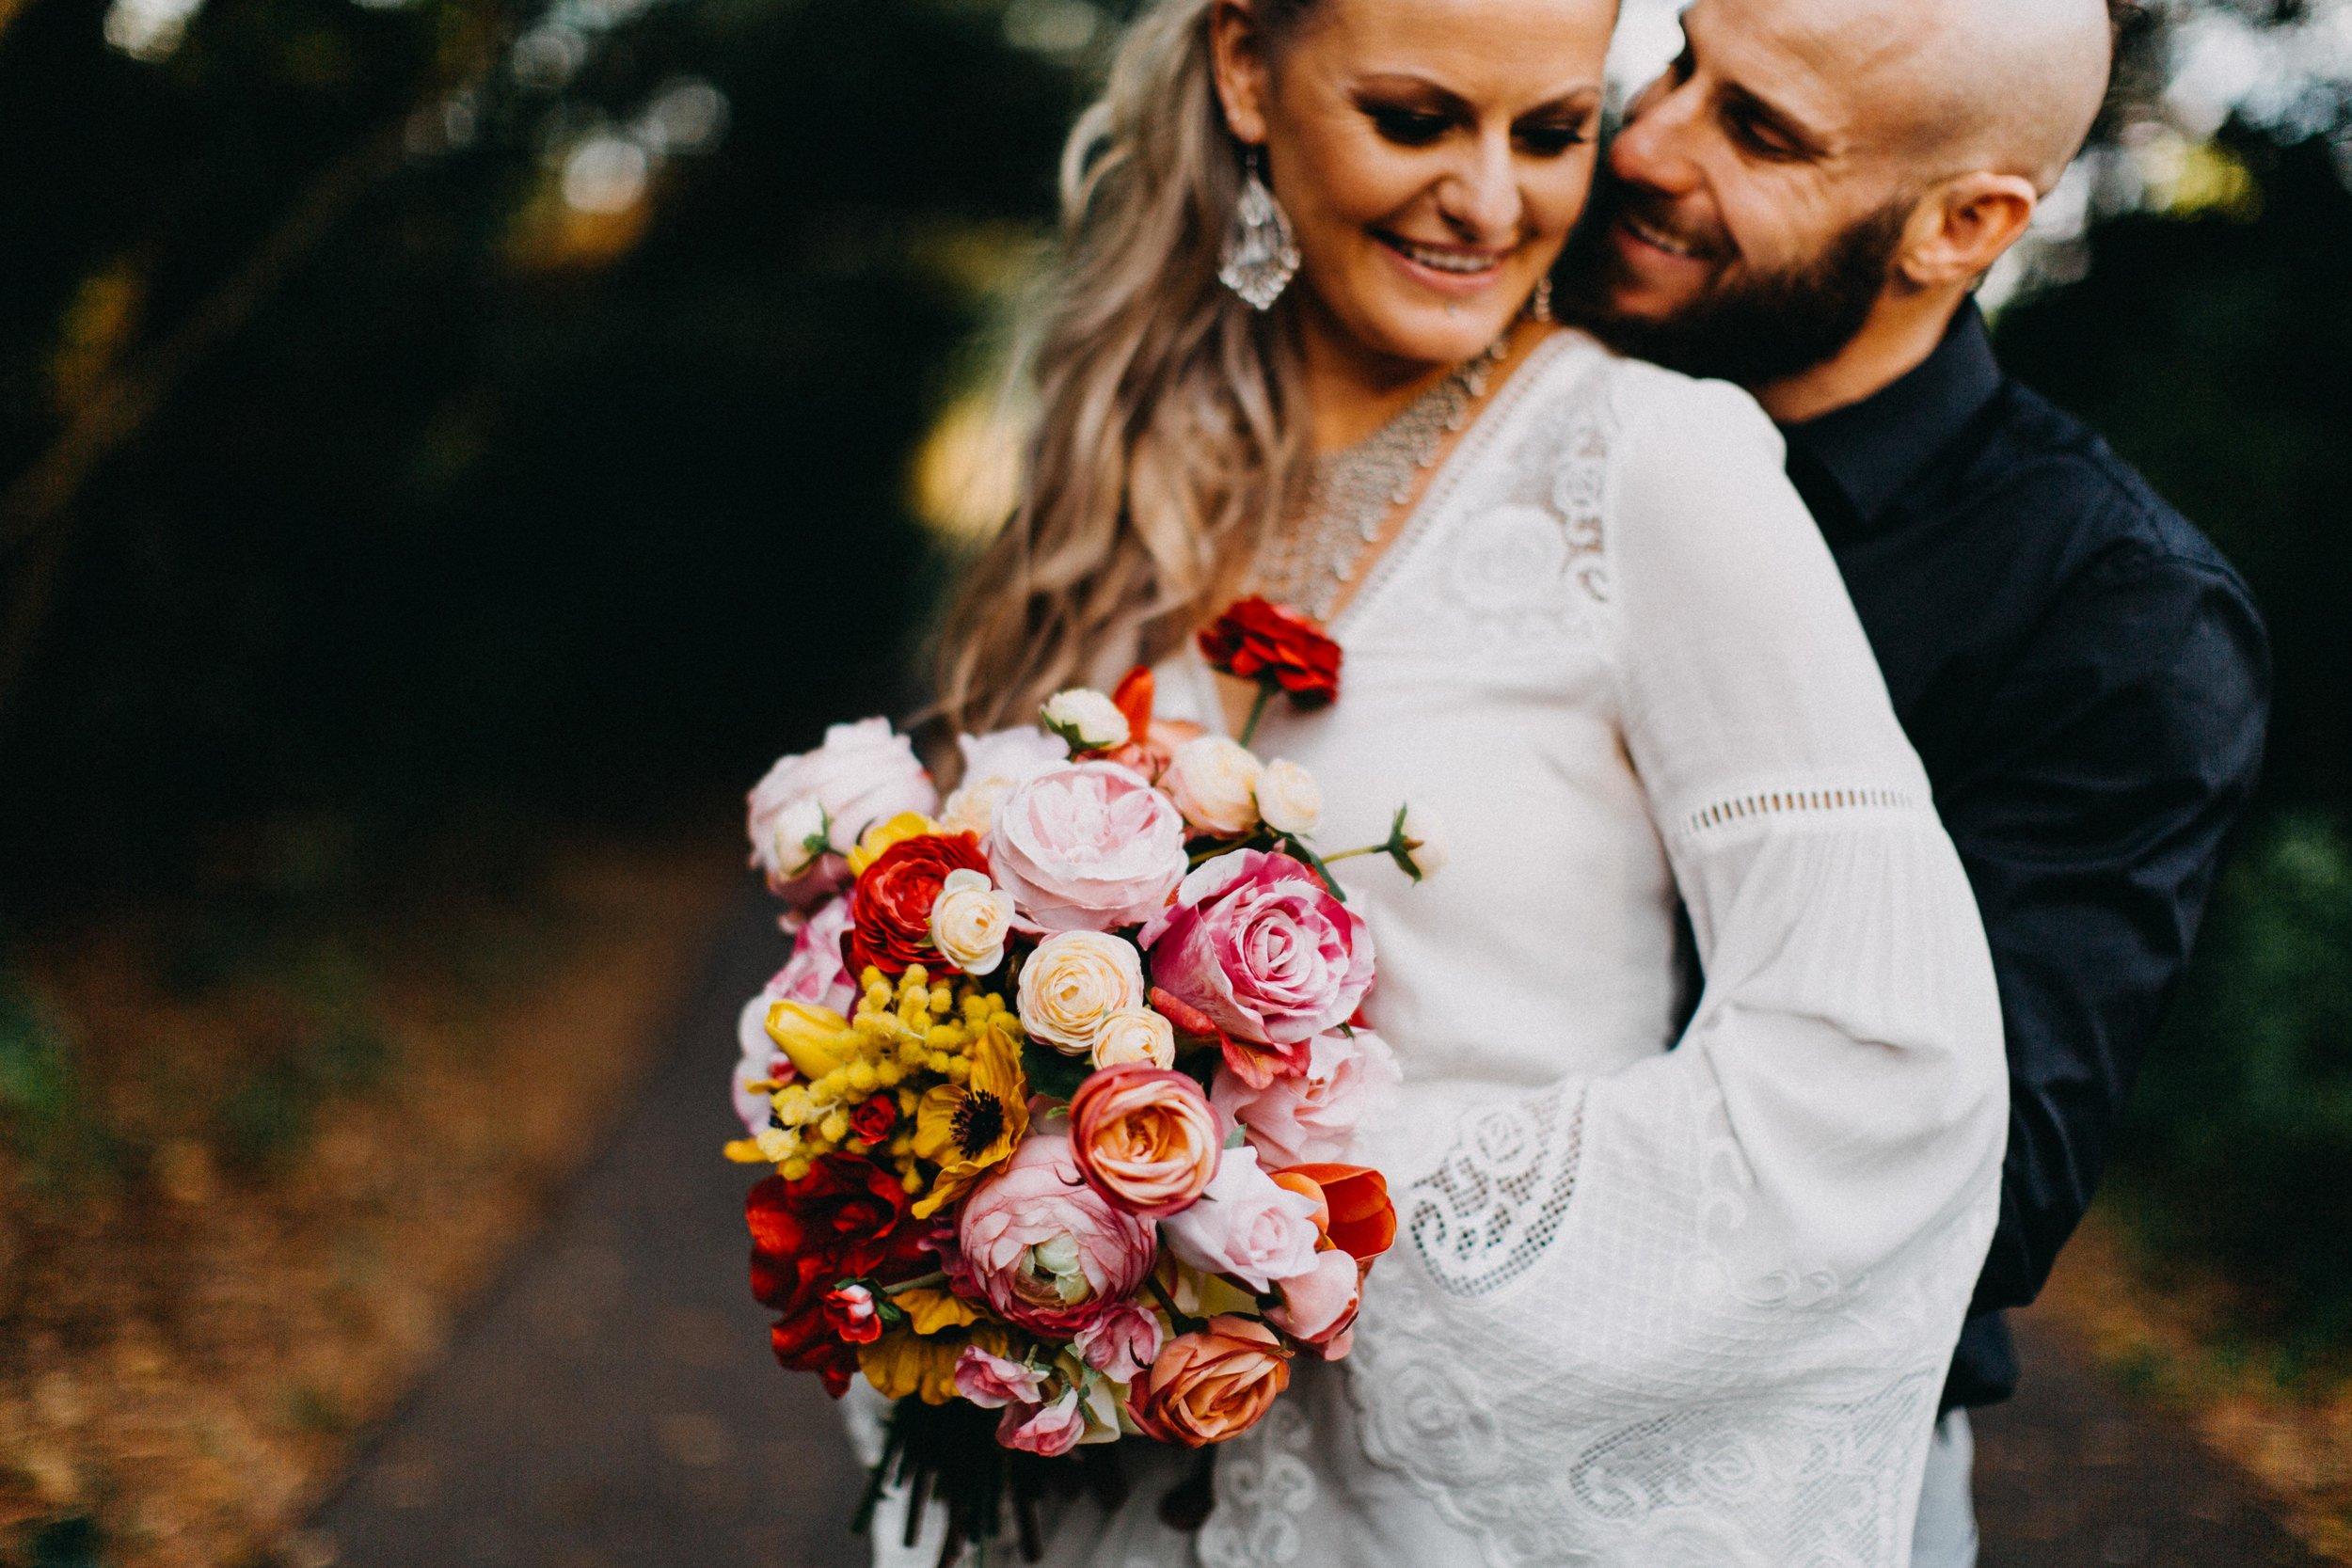 darwin-elopement-wedding-beach-camden-photography-www.emilyobrienphotography.net-53.jpg